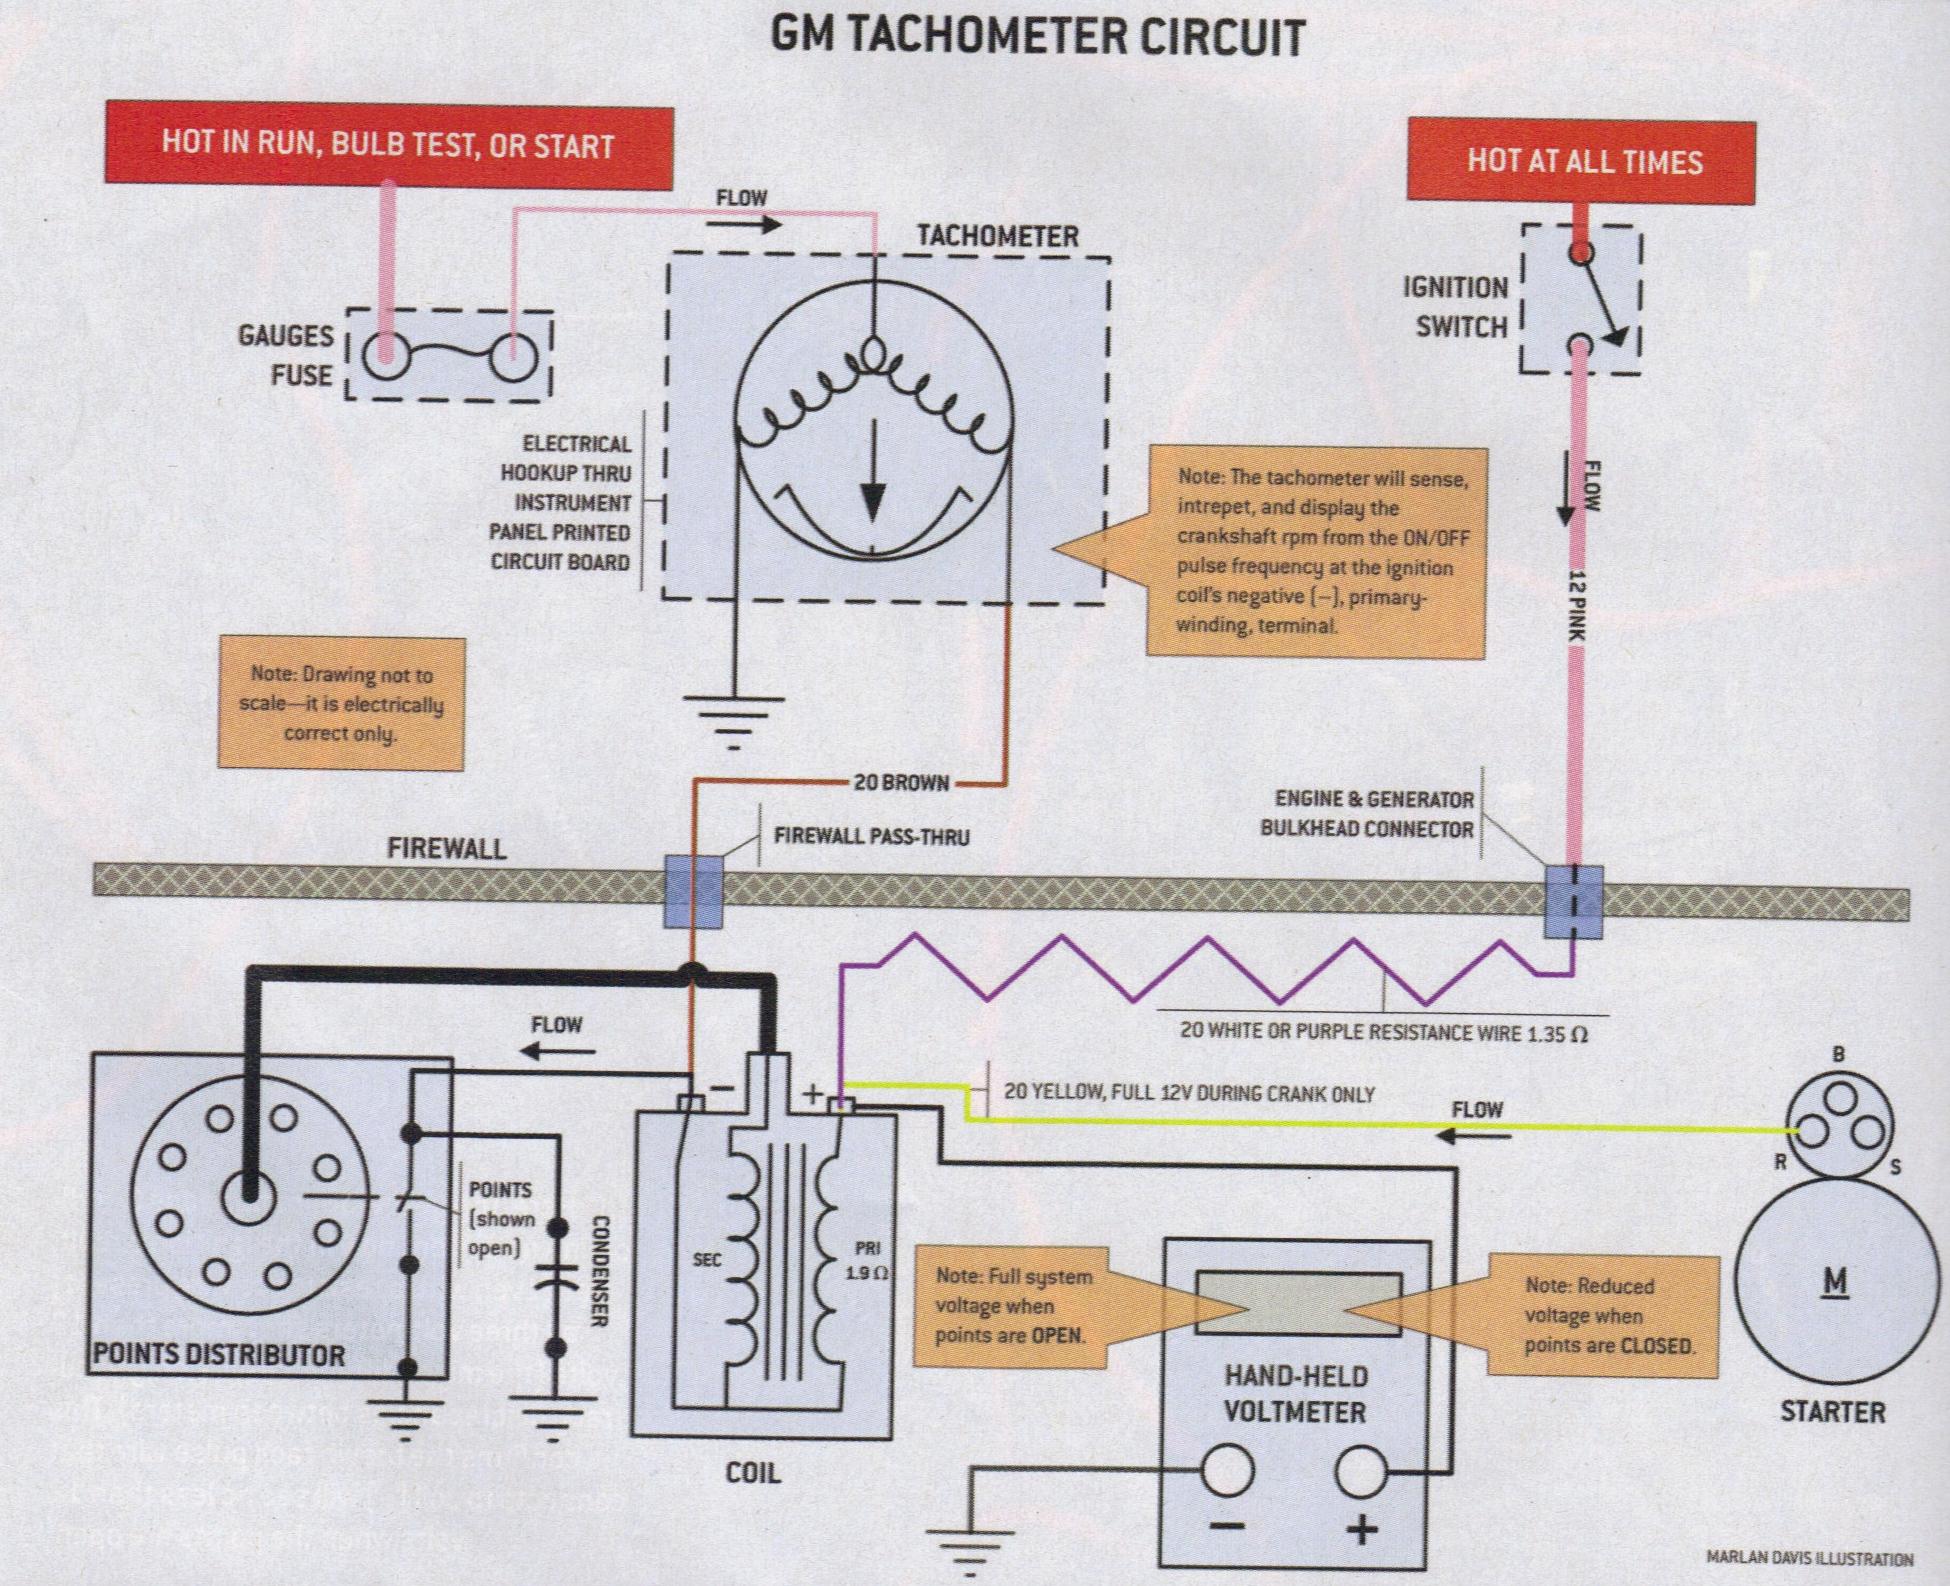 chevelle wiring diagram trane xl80 tach circuit maker